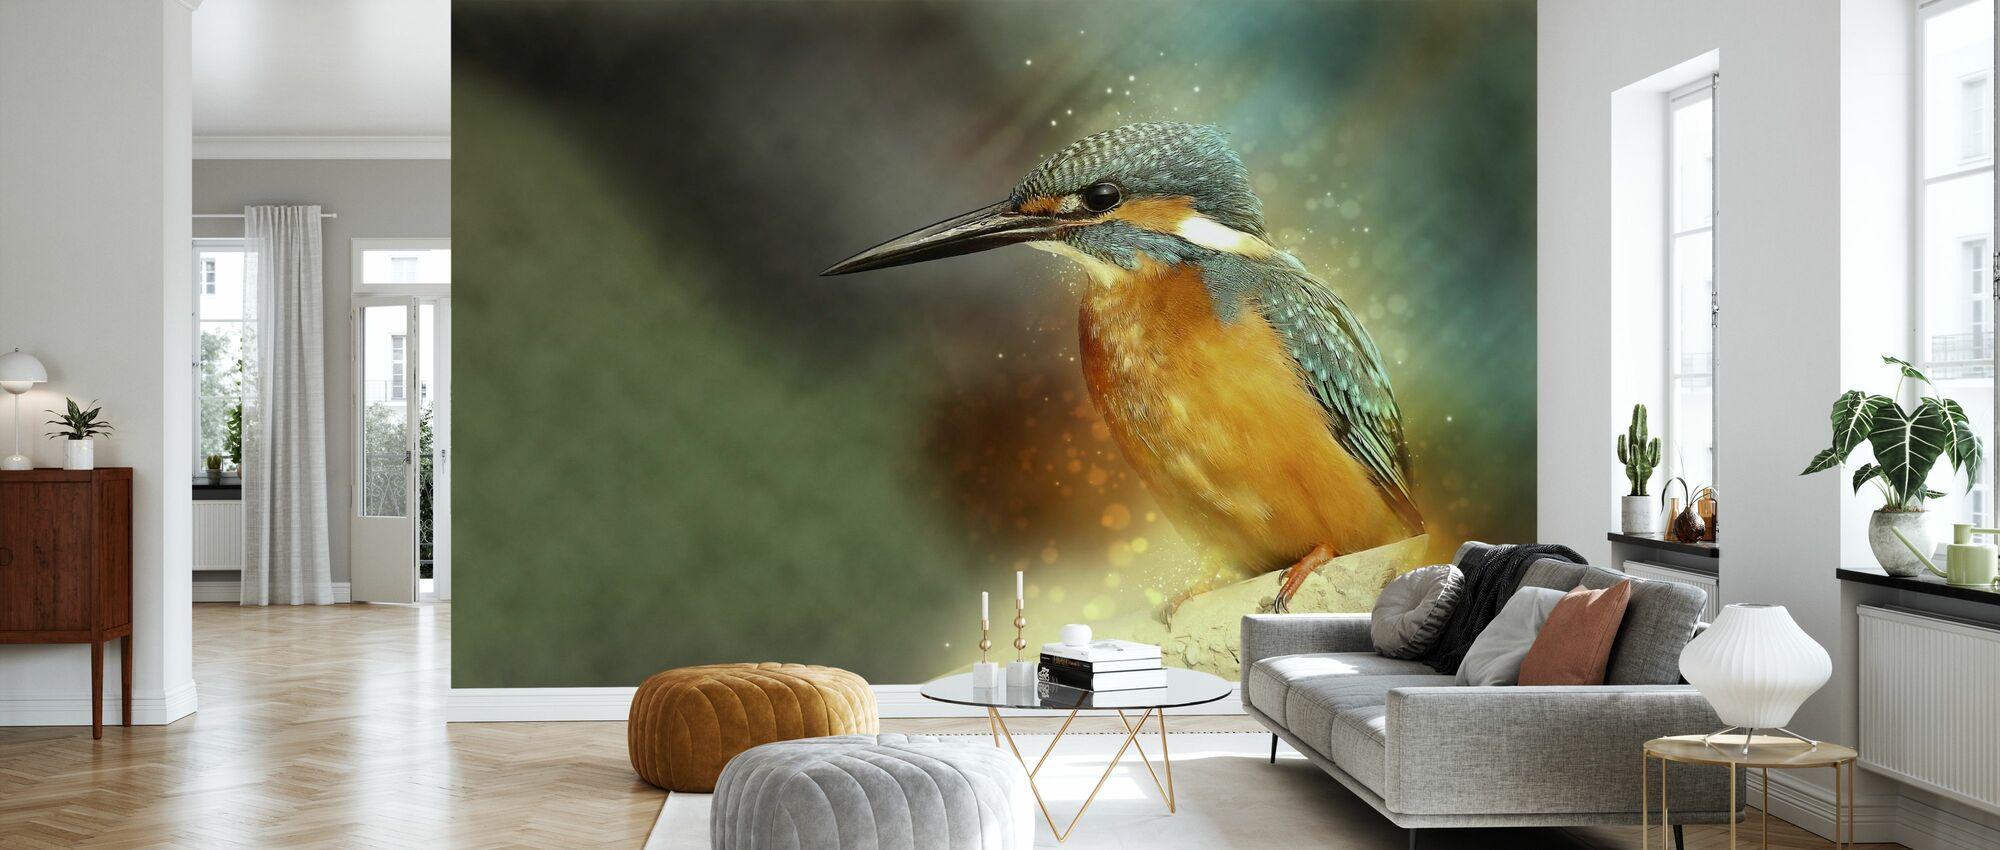 Kingfisher - Tapetti - Olohuone